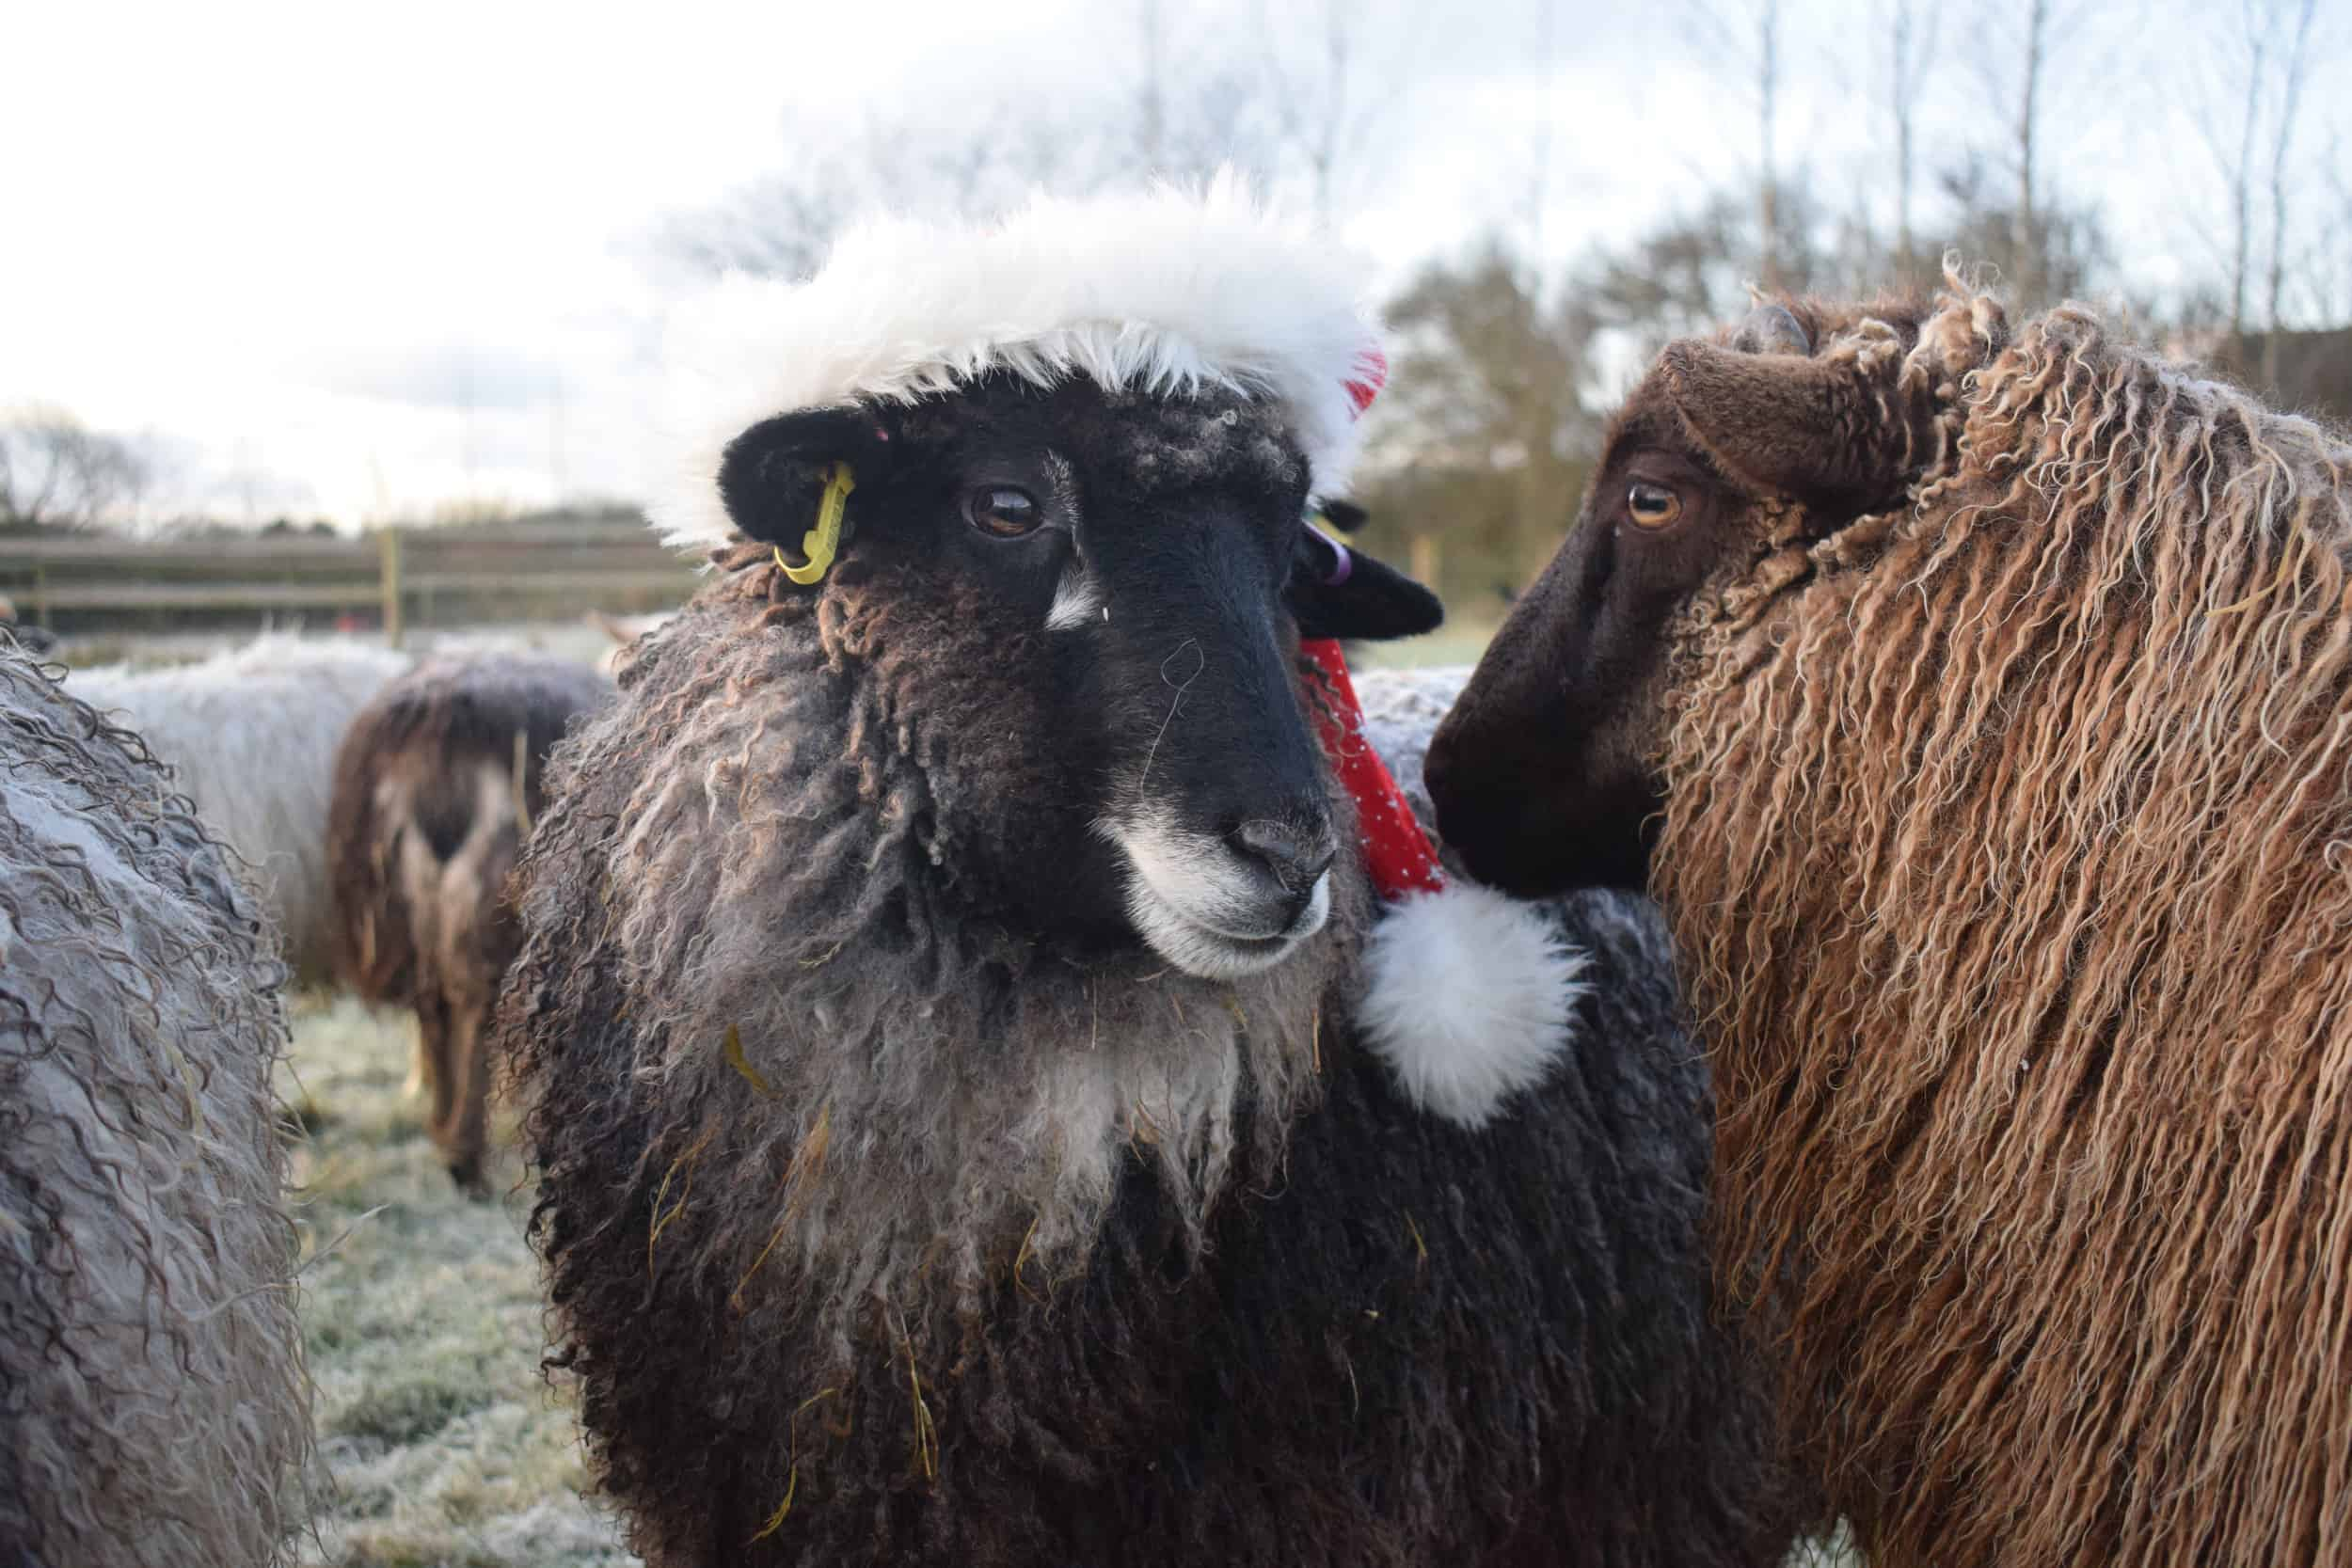 florence humphrey sheep xmas santa hat coloured leicester longwool gotland shetland sheep crossbreed english blue kind fibre